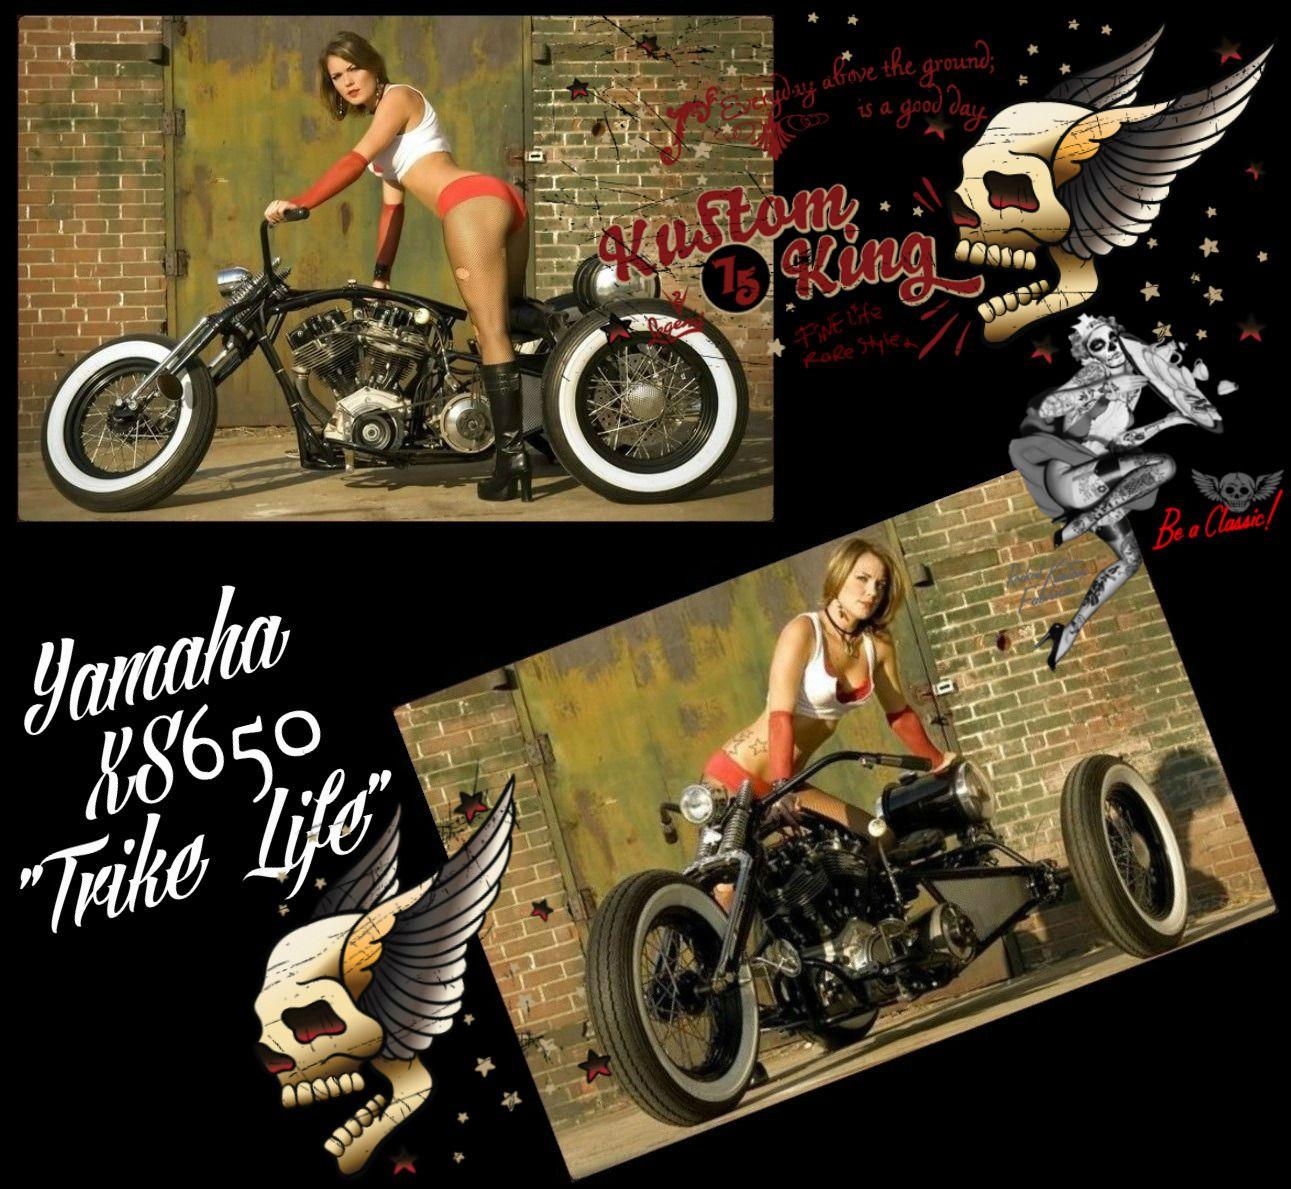 "Yamaha XS650 Trike ""Trike Life"".    http://kustomking.blogspot.co.uk/2011/08/trike-life.html"